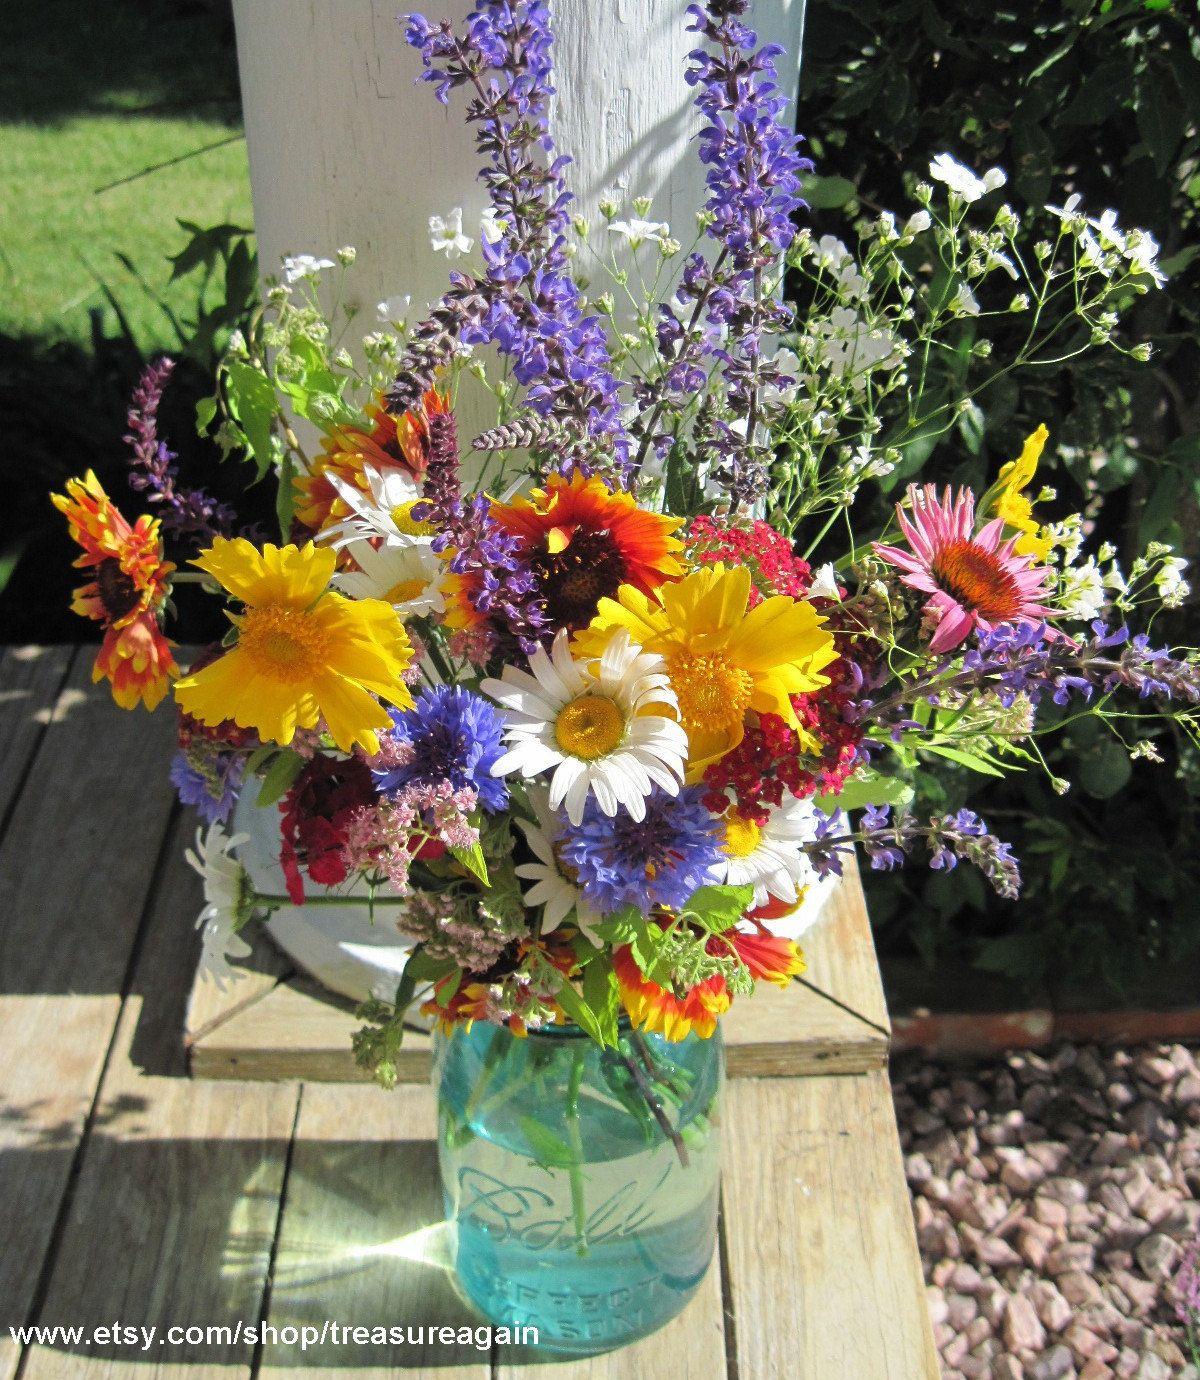 Wedding Flowers In Mason Jars: Mason Jar Vase Flower Frog Lid Antique Blue Mason Jars